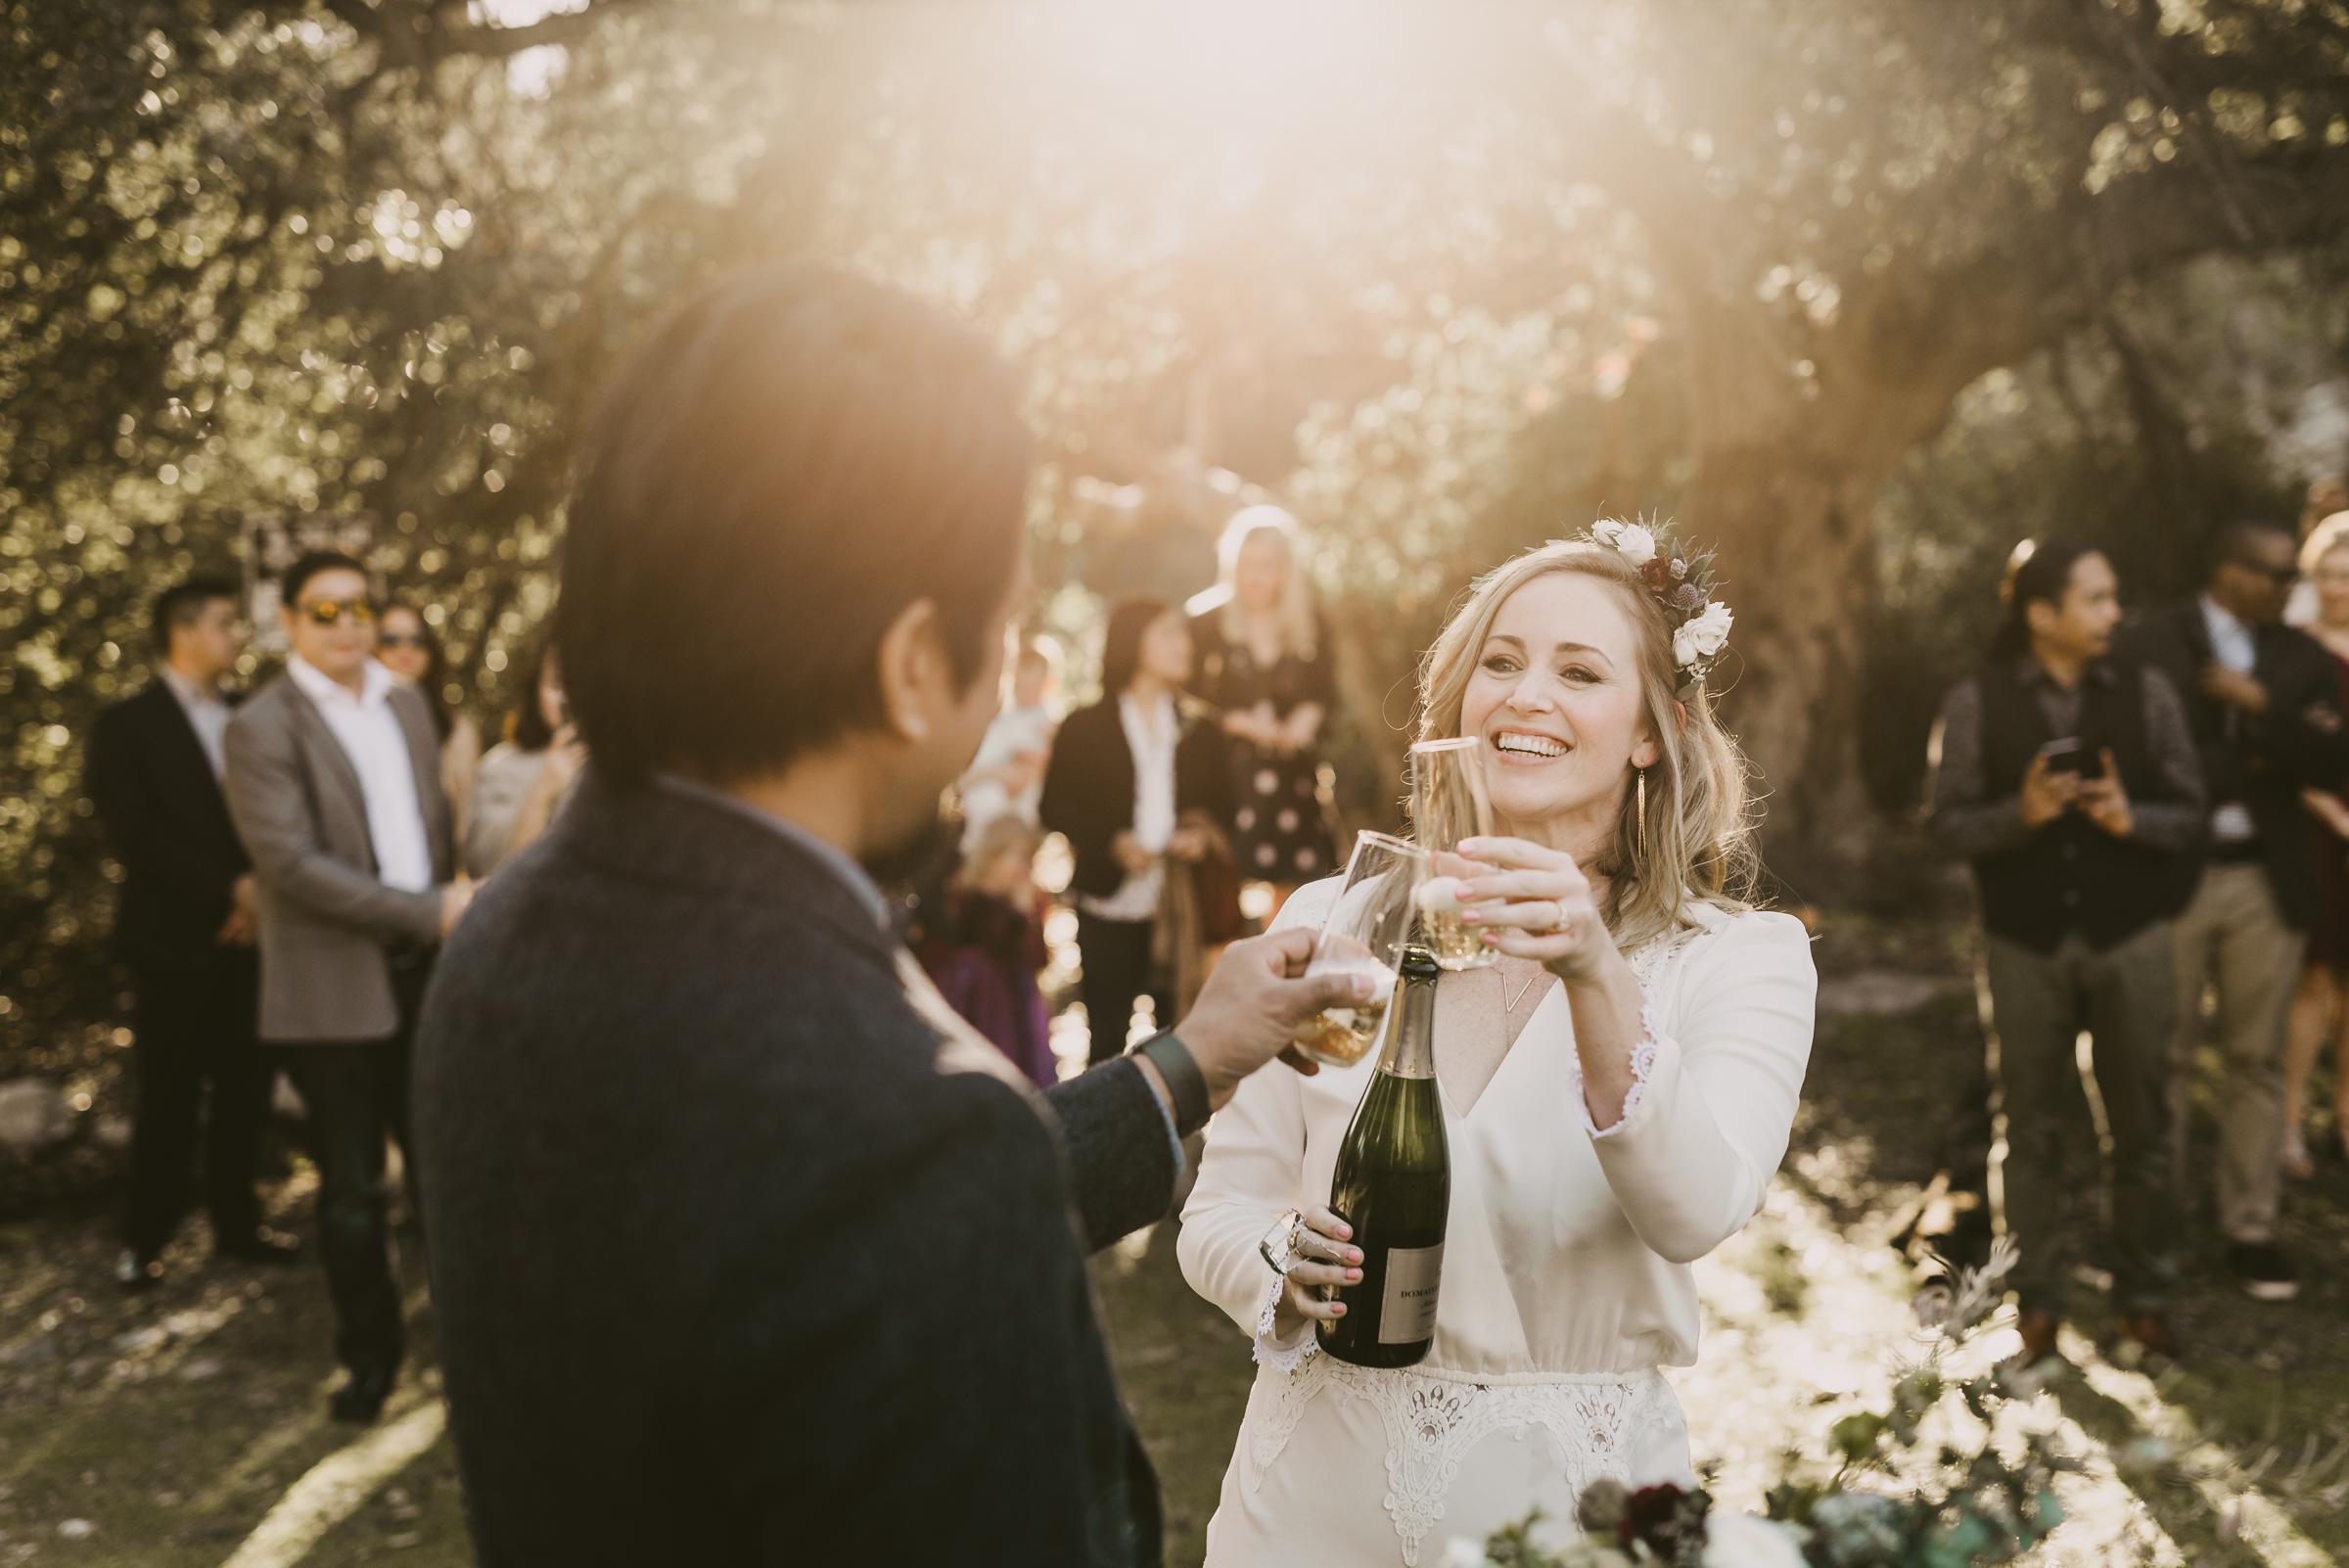 ©Isaiah + Taylor Photography - Intimate Elopement, Eaton Canyon, Los Angeles Wedding Photographer-45.jpg